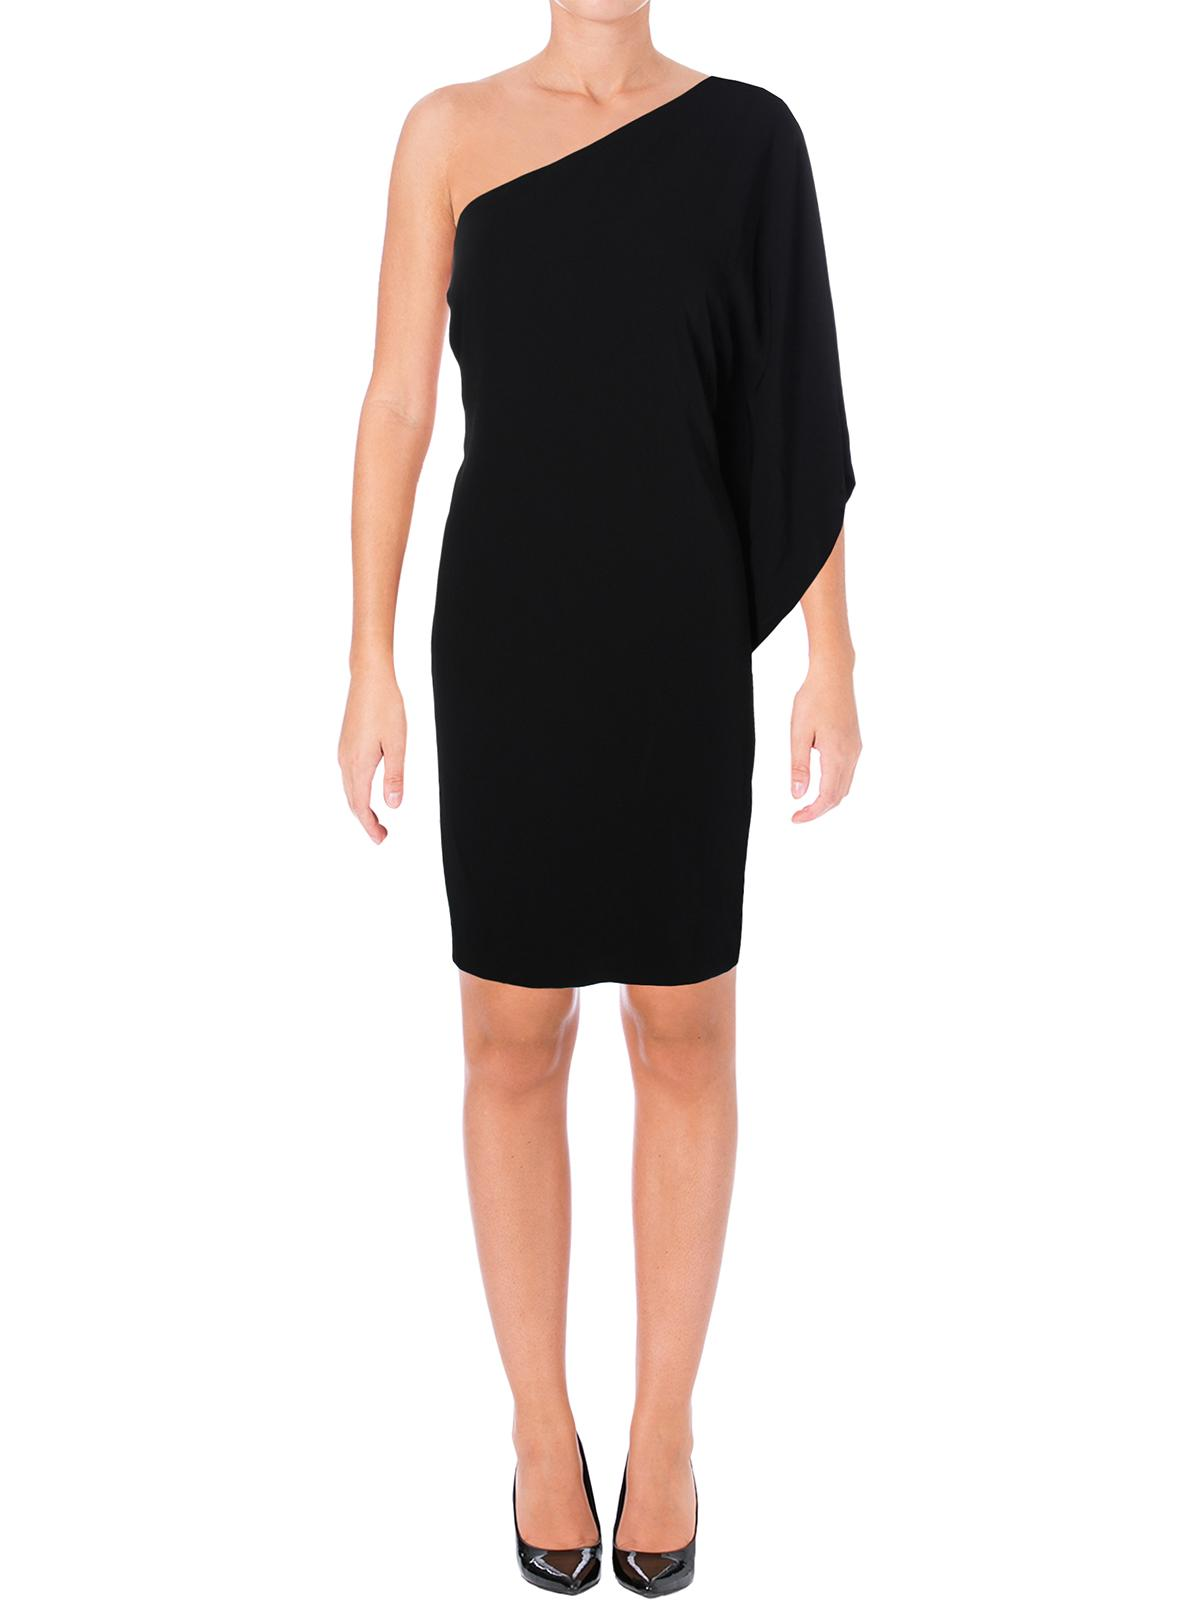 Lauren Ralph Lauren Womens Giuditta Ruffled One Shoulder Cocktail Dress